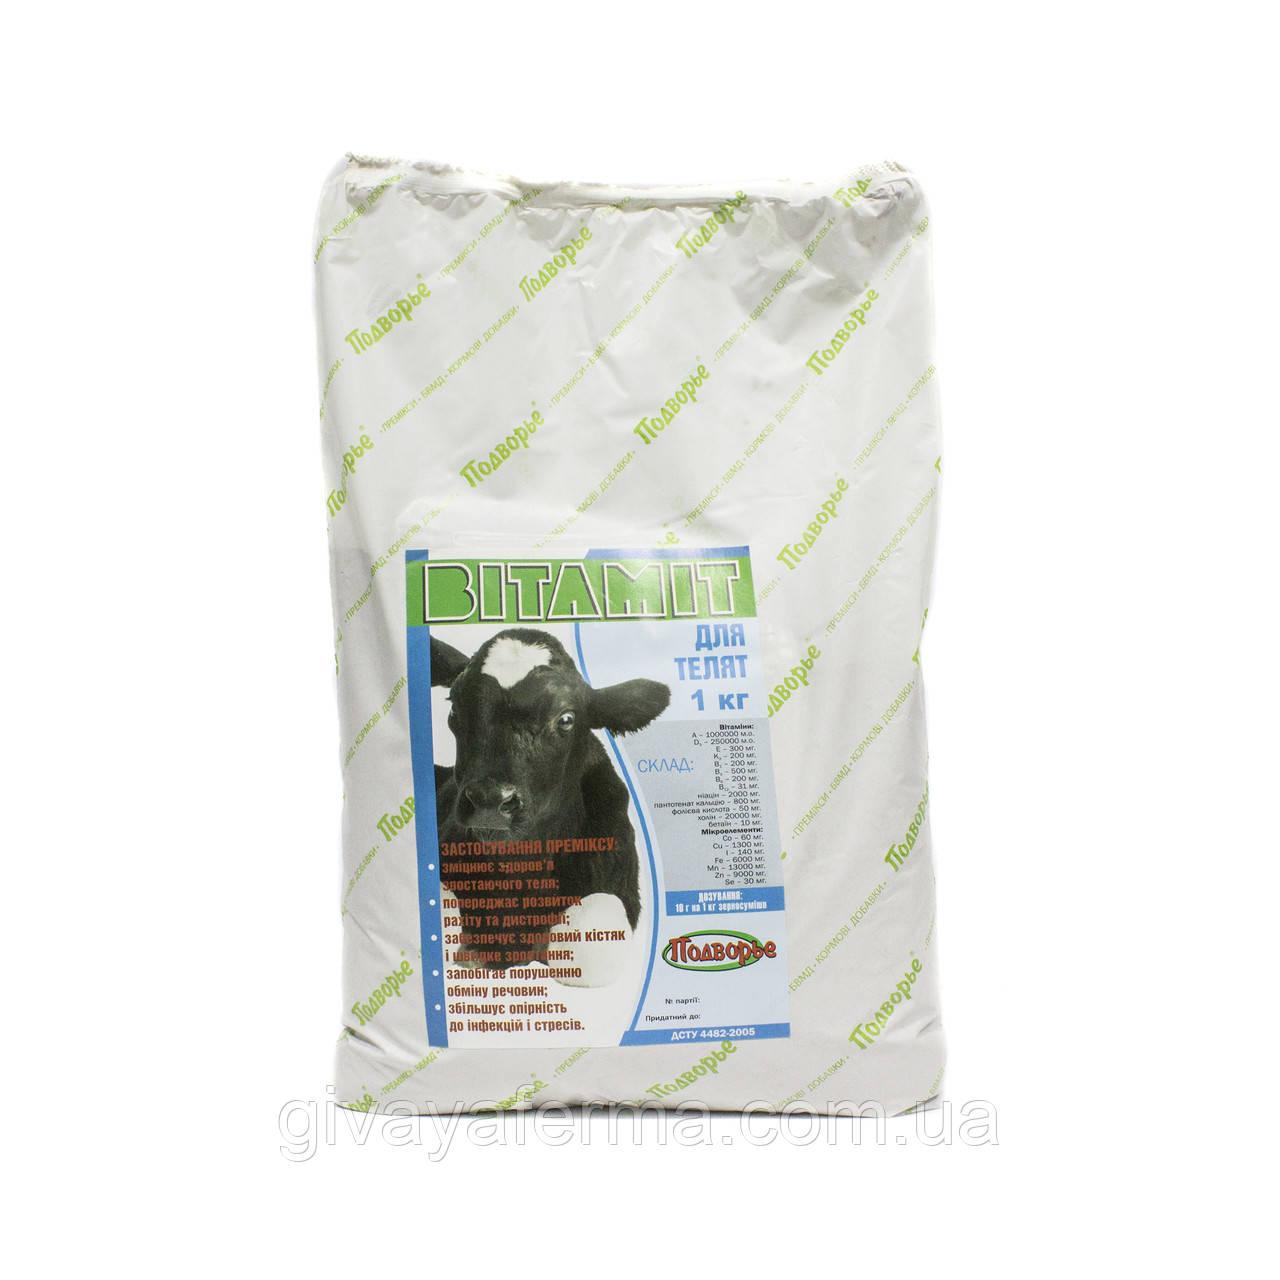 Витаминный премикс Витамит - теленок 1%, 1 кг, добавка к корму